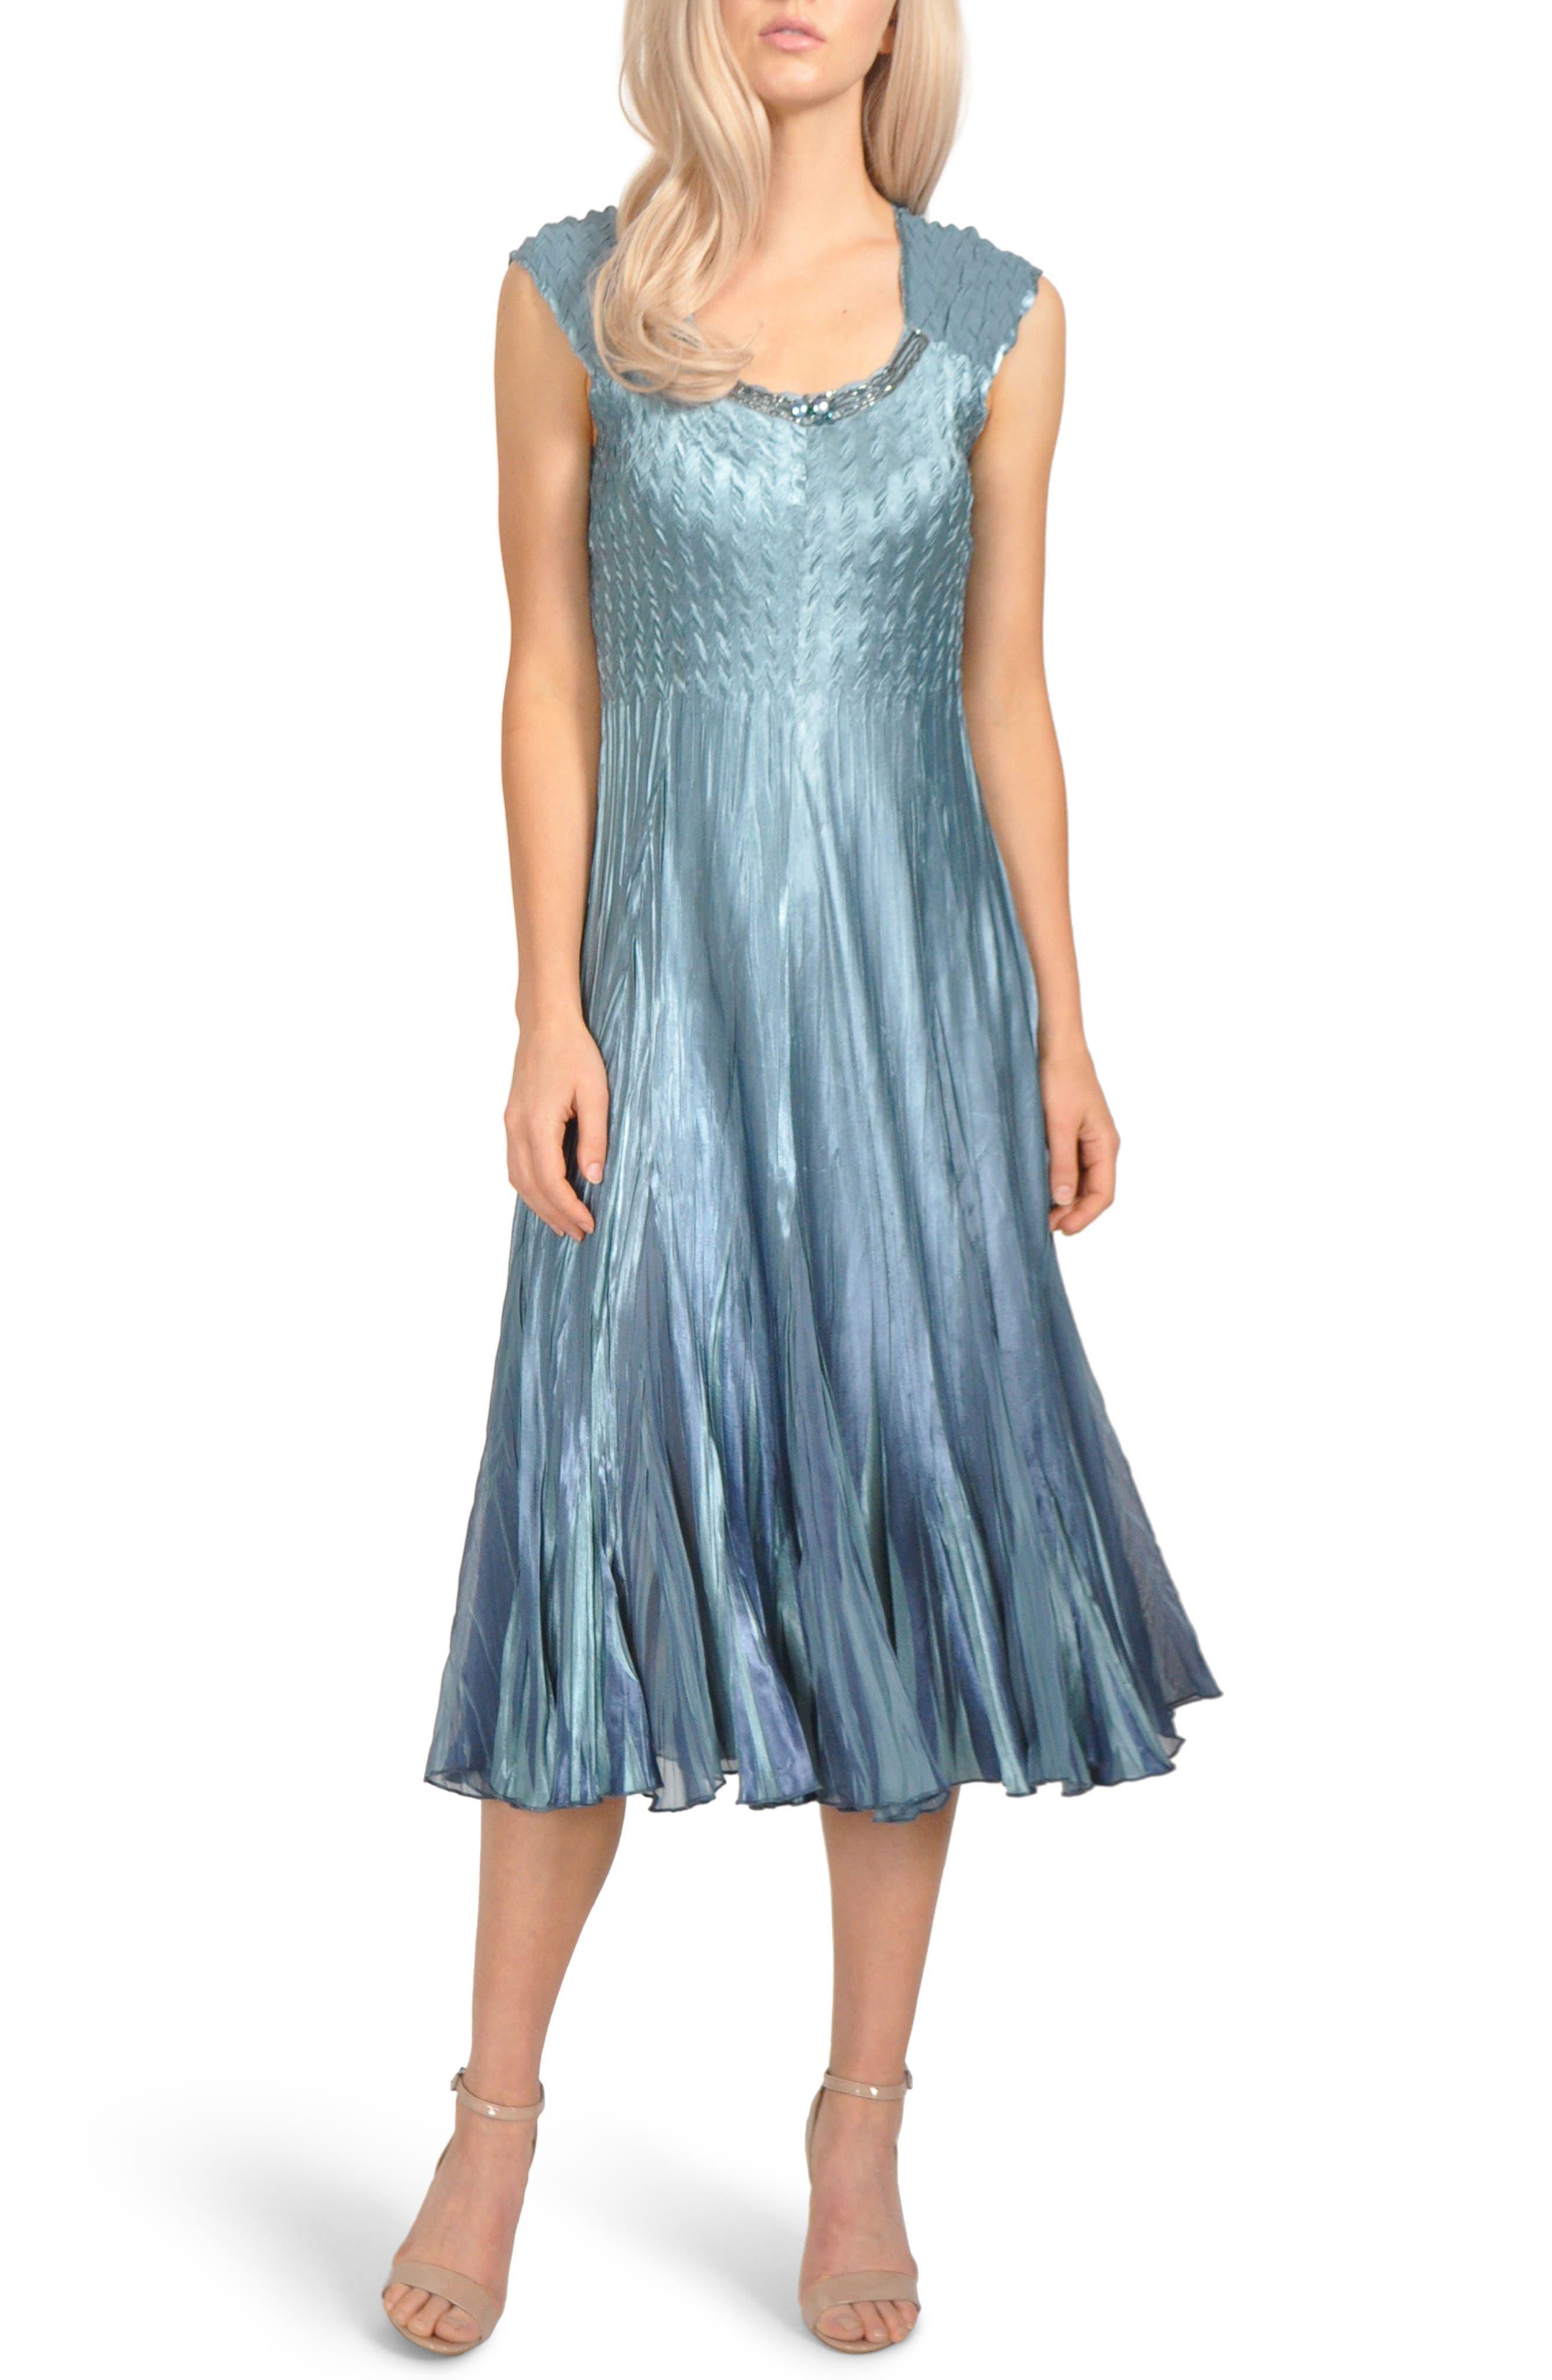 KOMAROV, Embellished Pleat Mixed Media Dress with Jacket, Alternate thumbnail 3, color, 405